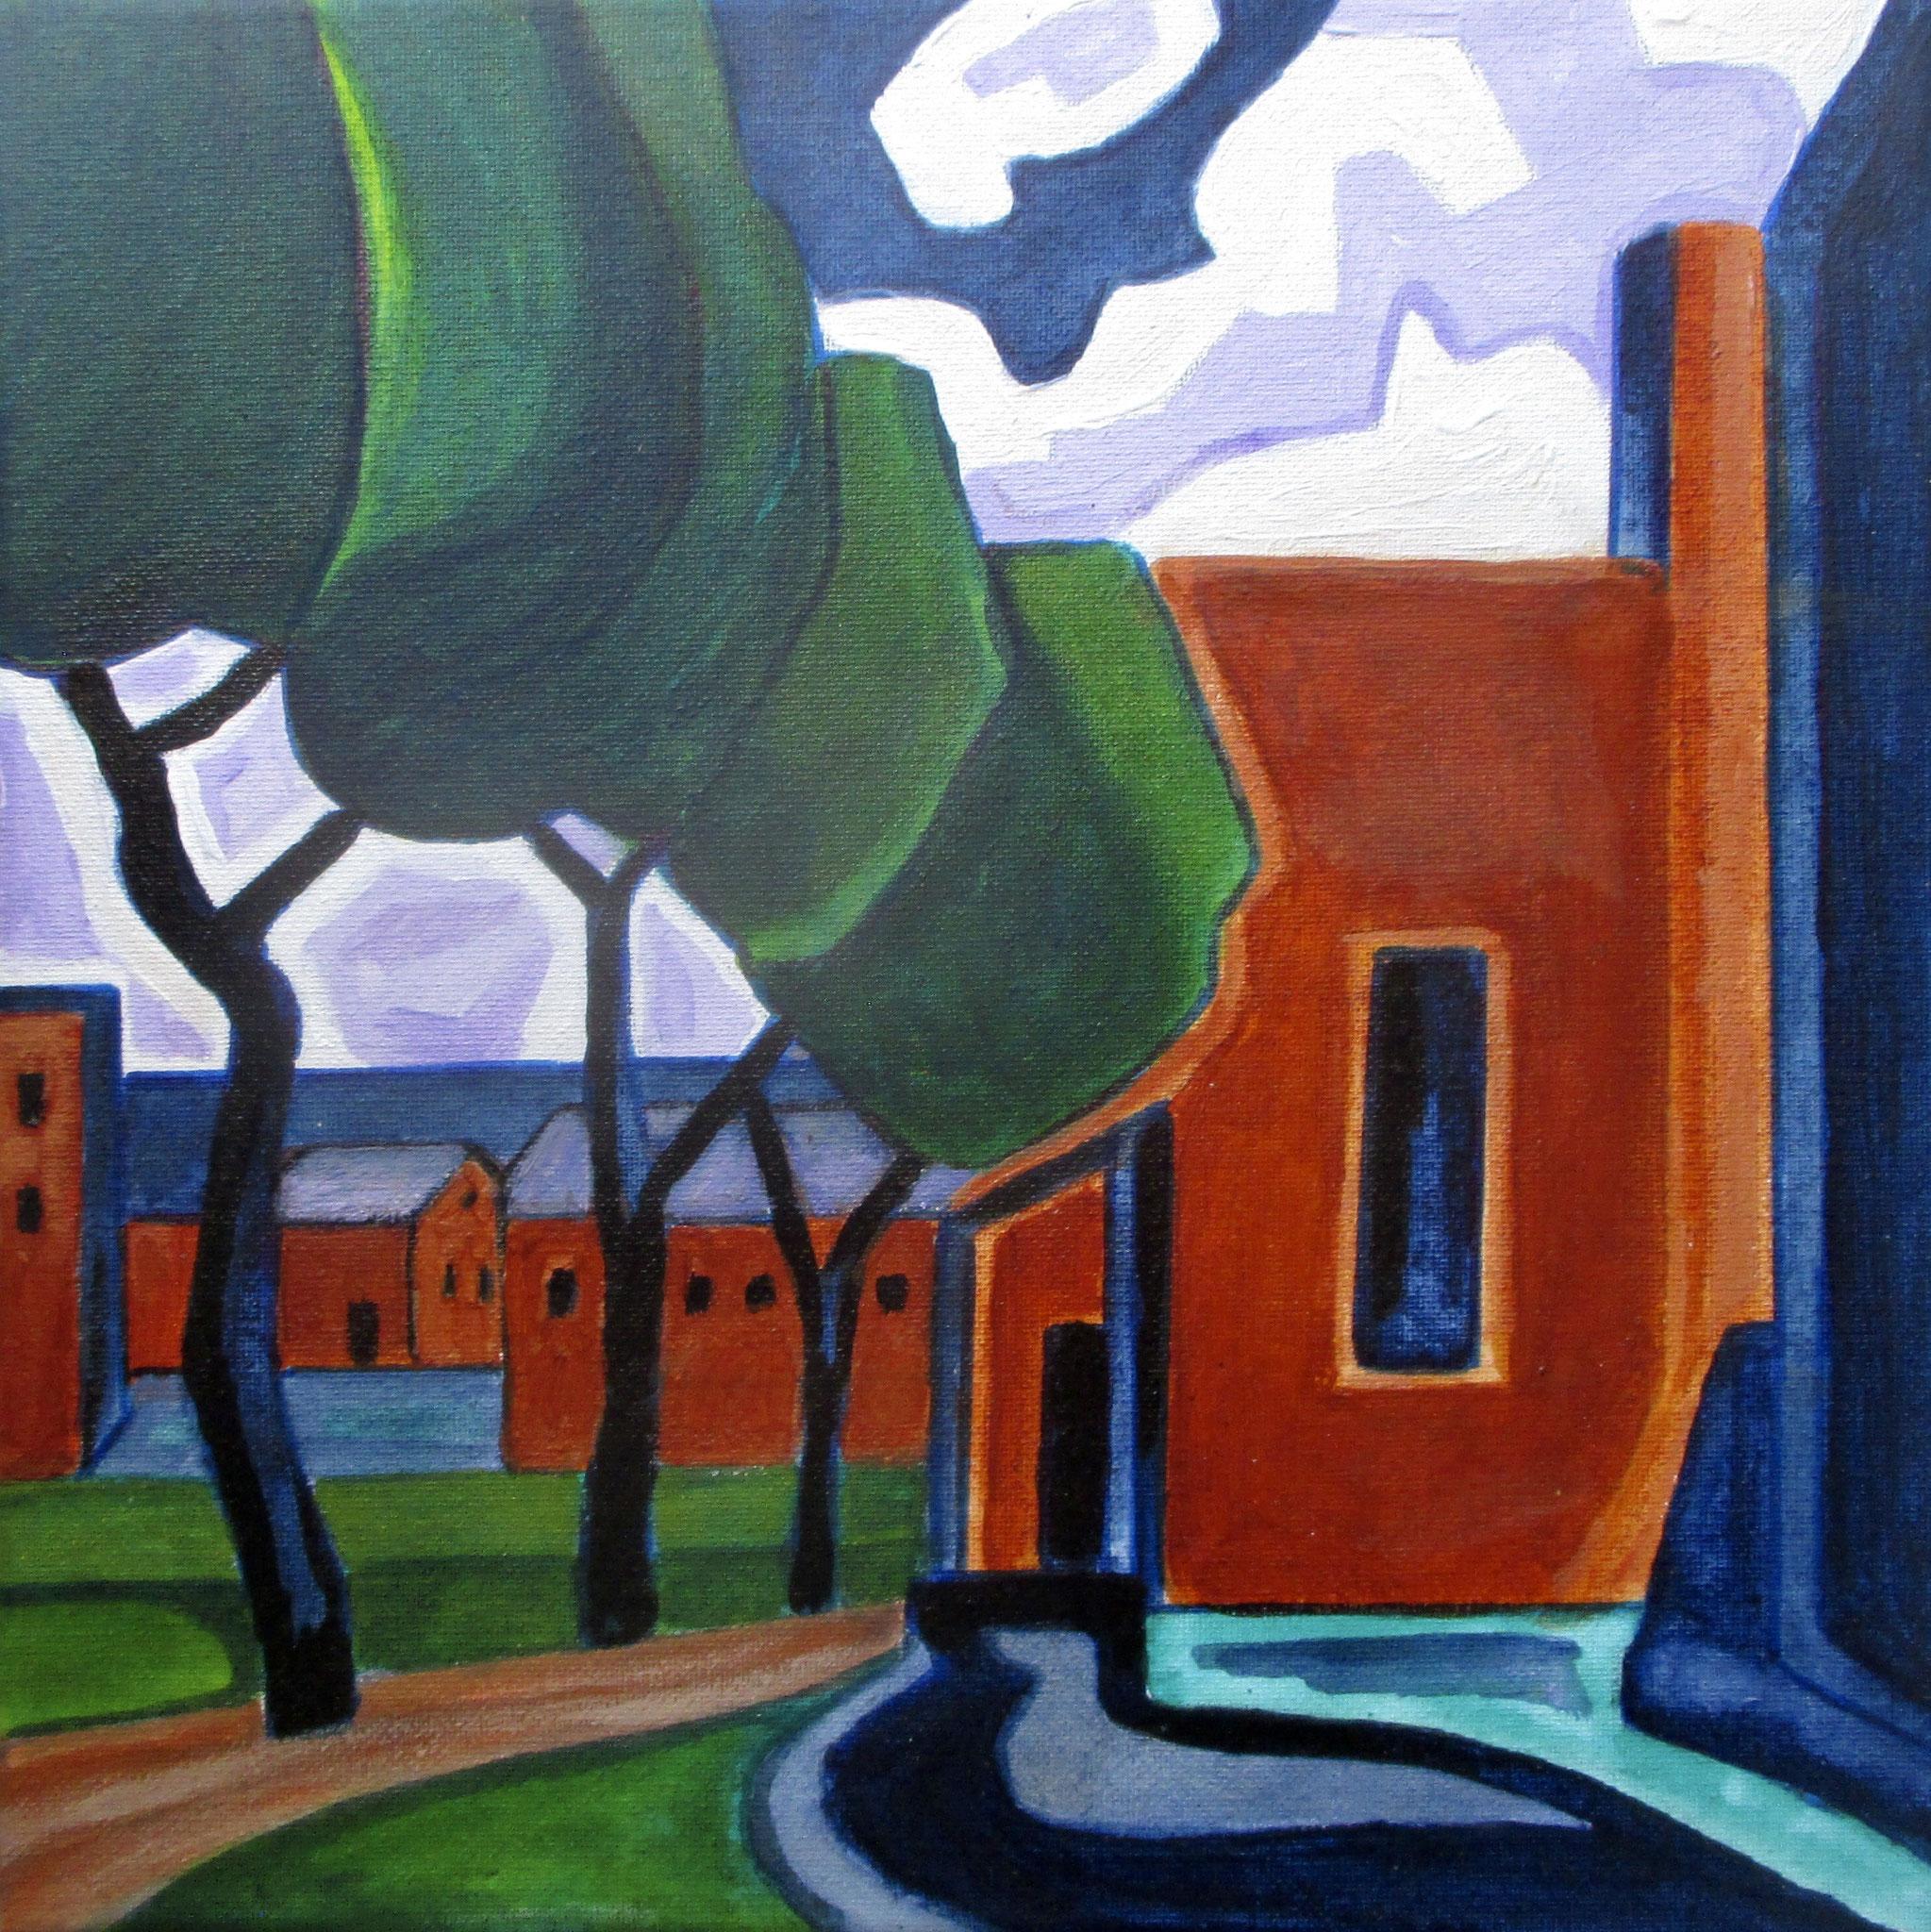 Adobe Village, acrylic on canvas, 12 x 12